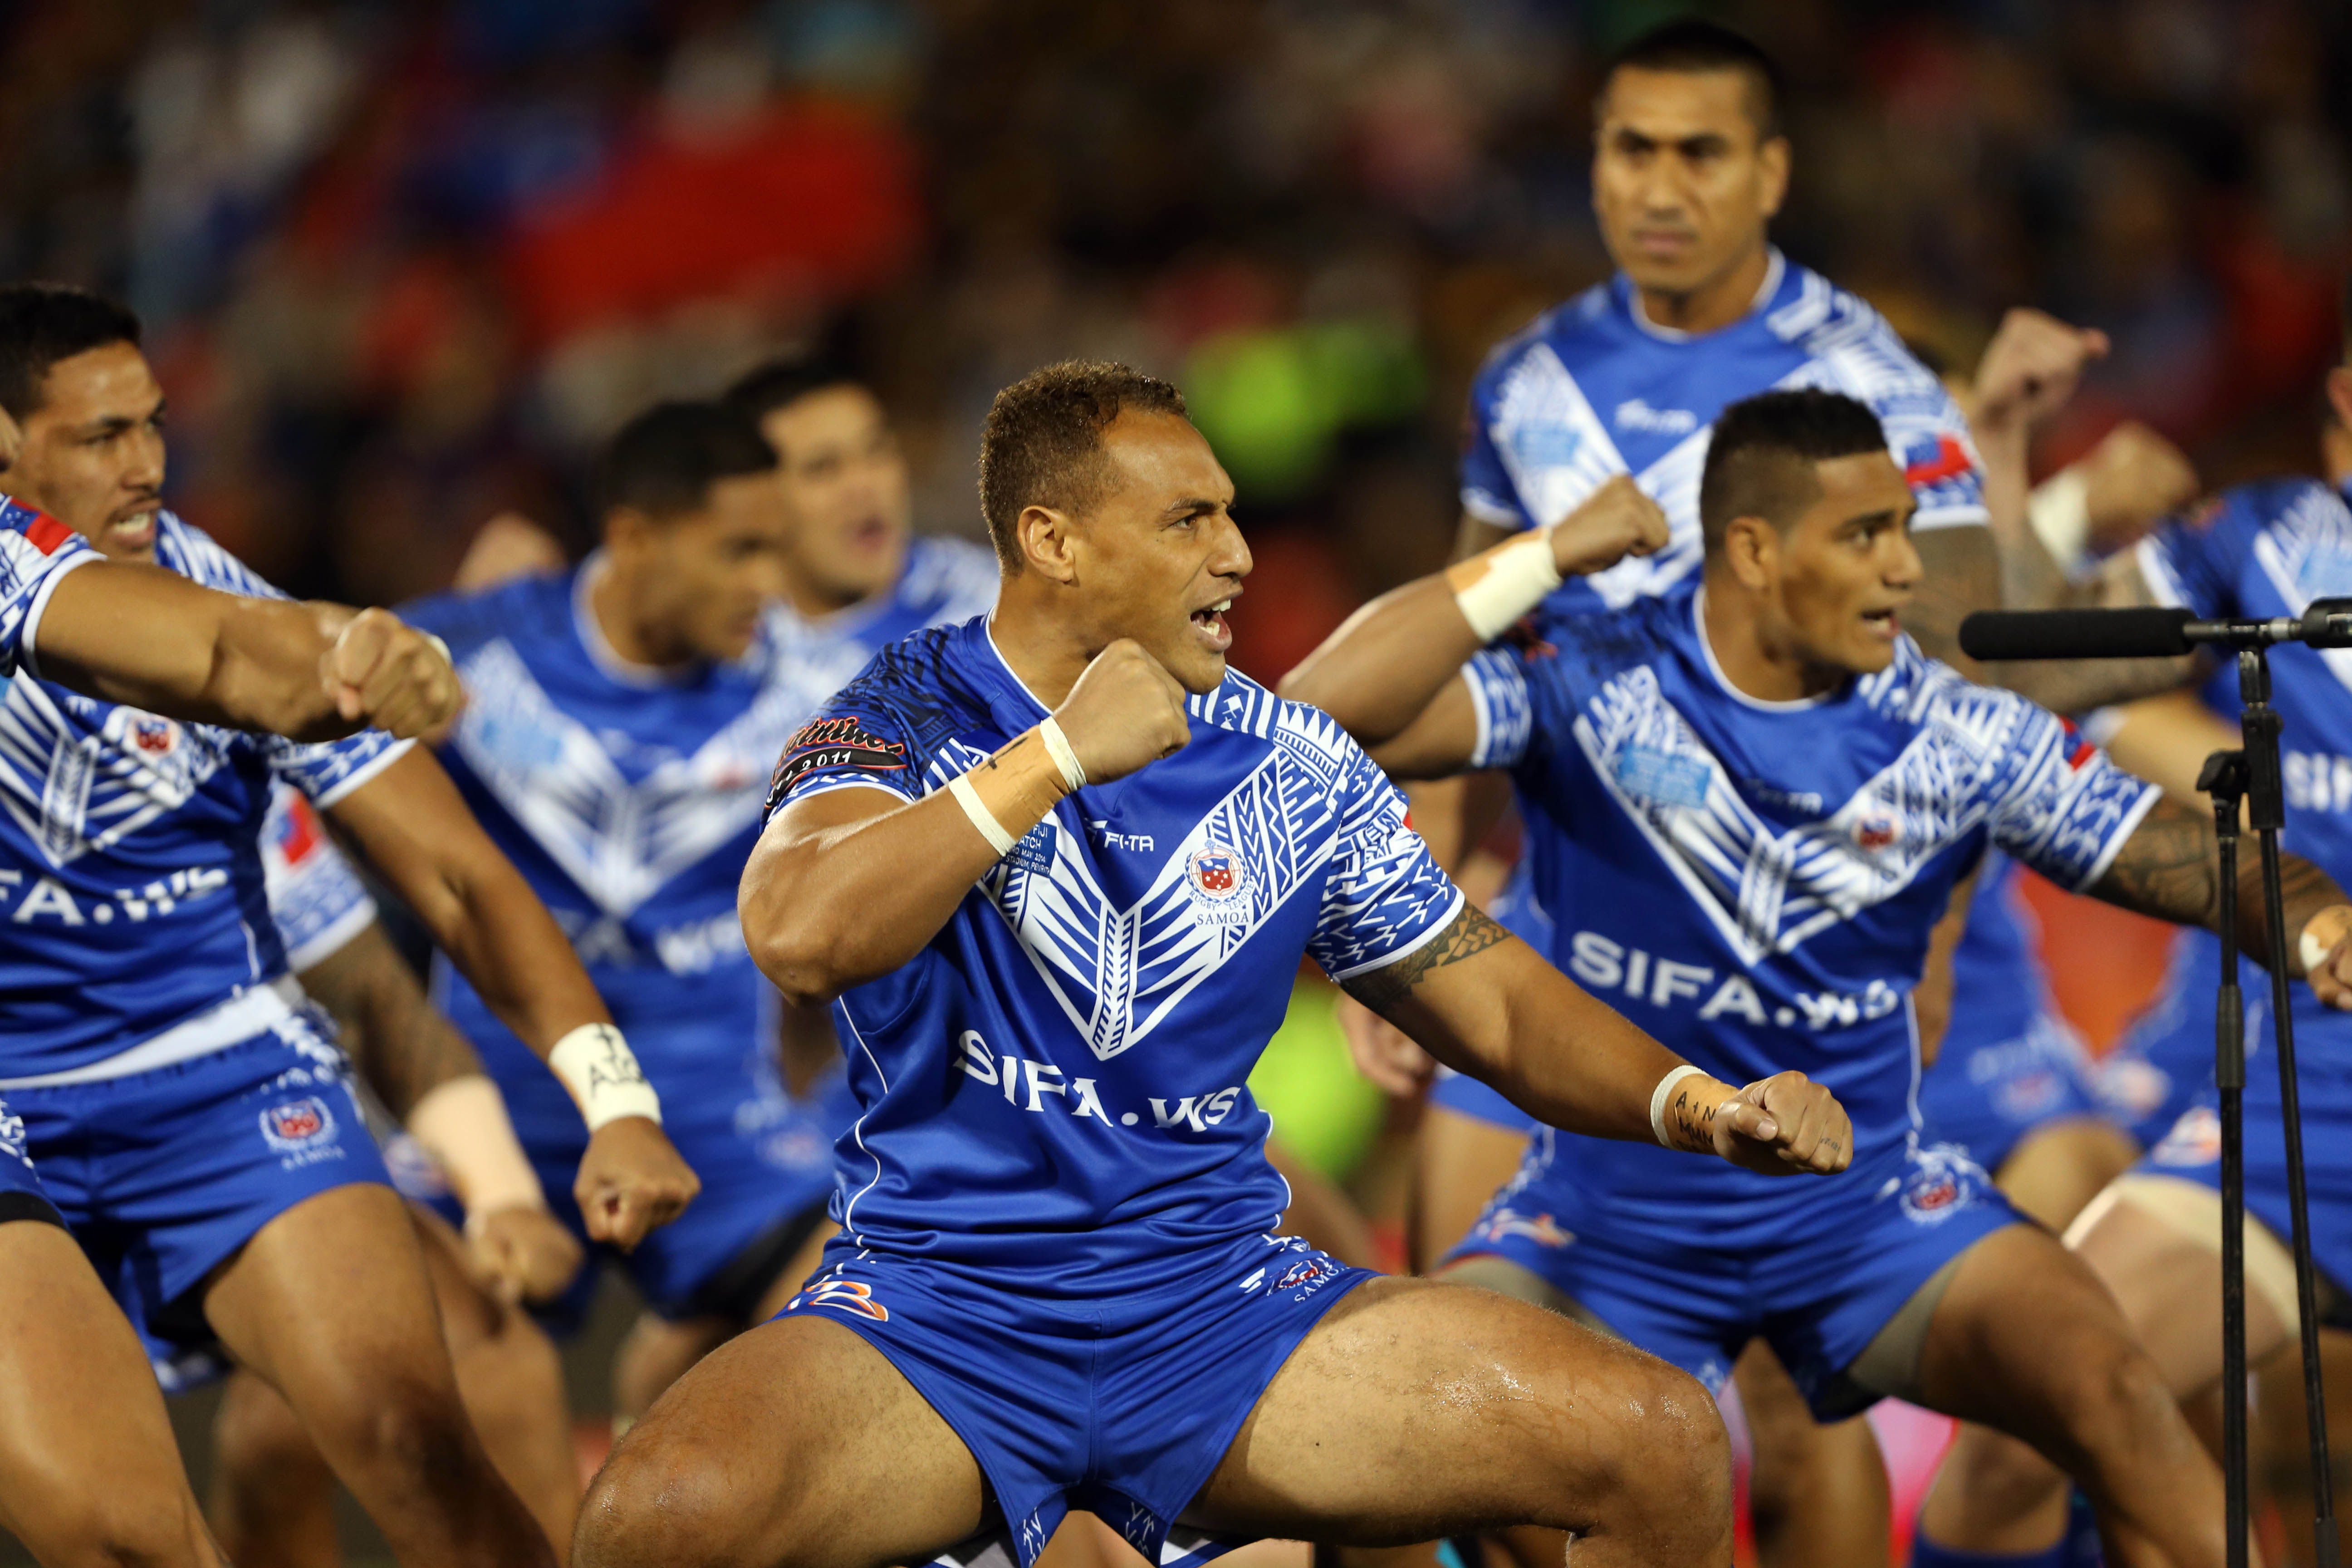 Samoa - Asia Pacific Rugby League Confederation